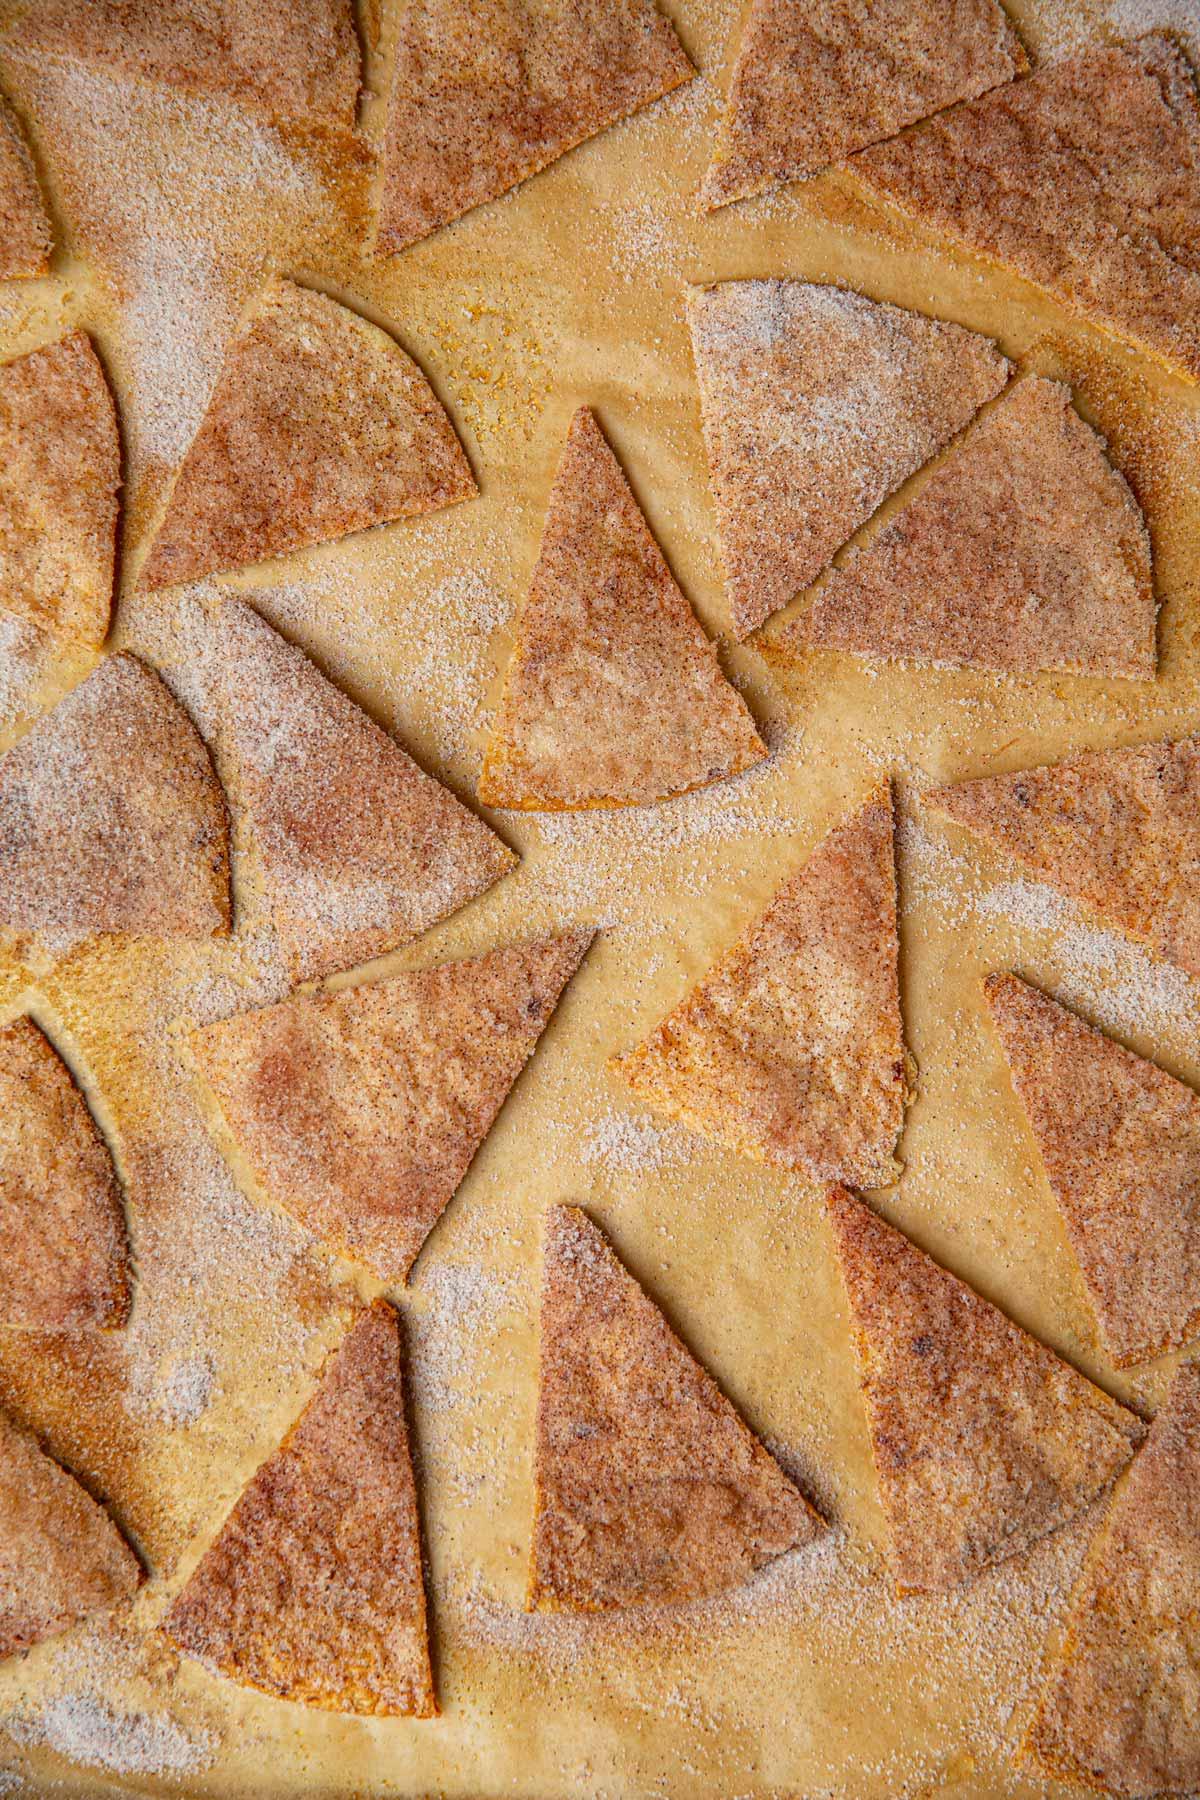 Cinnamon Sugar Tortilla Chips on baking sheet